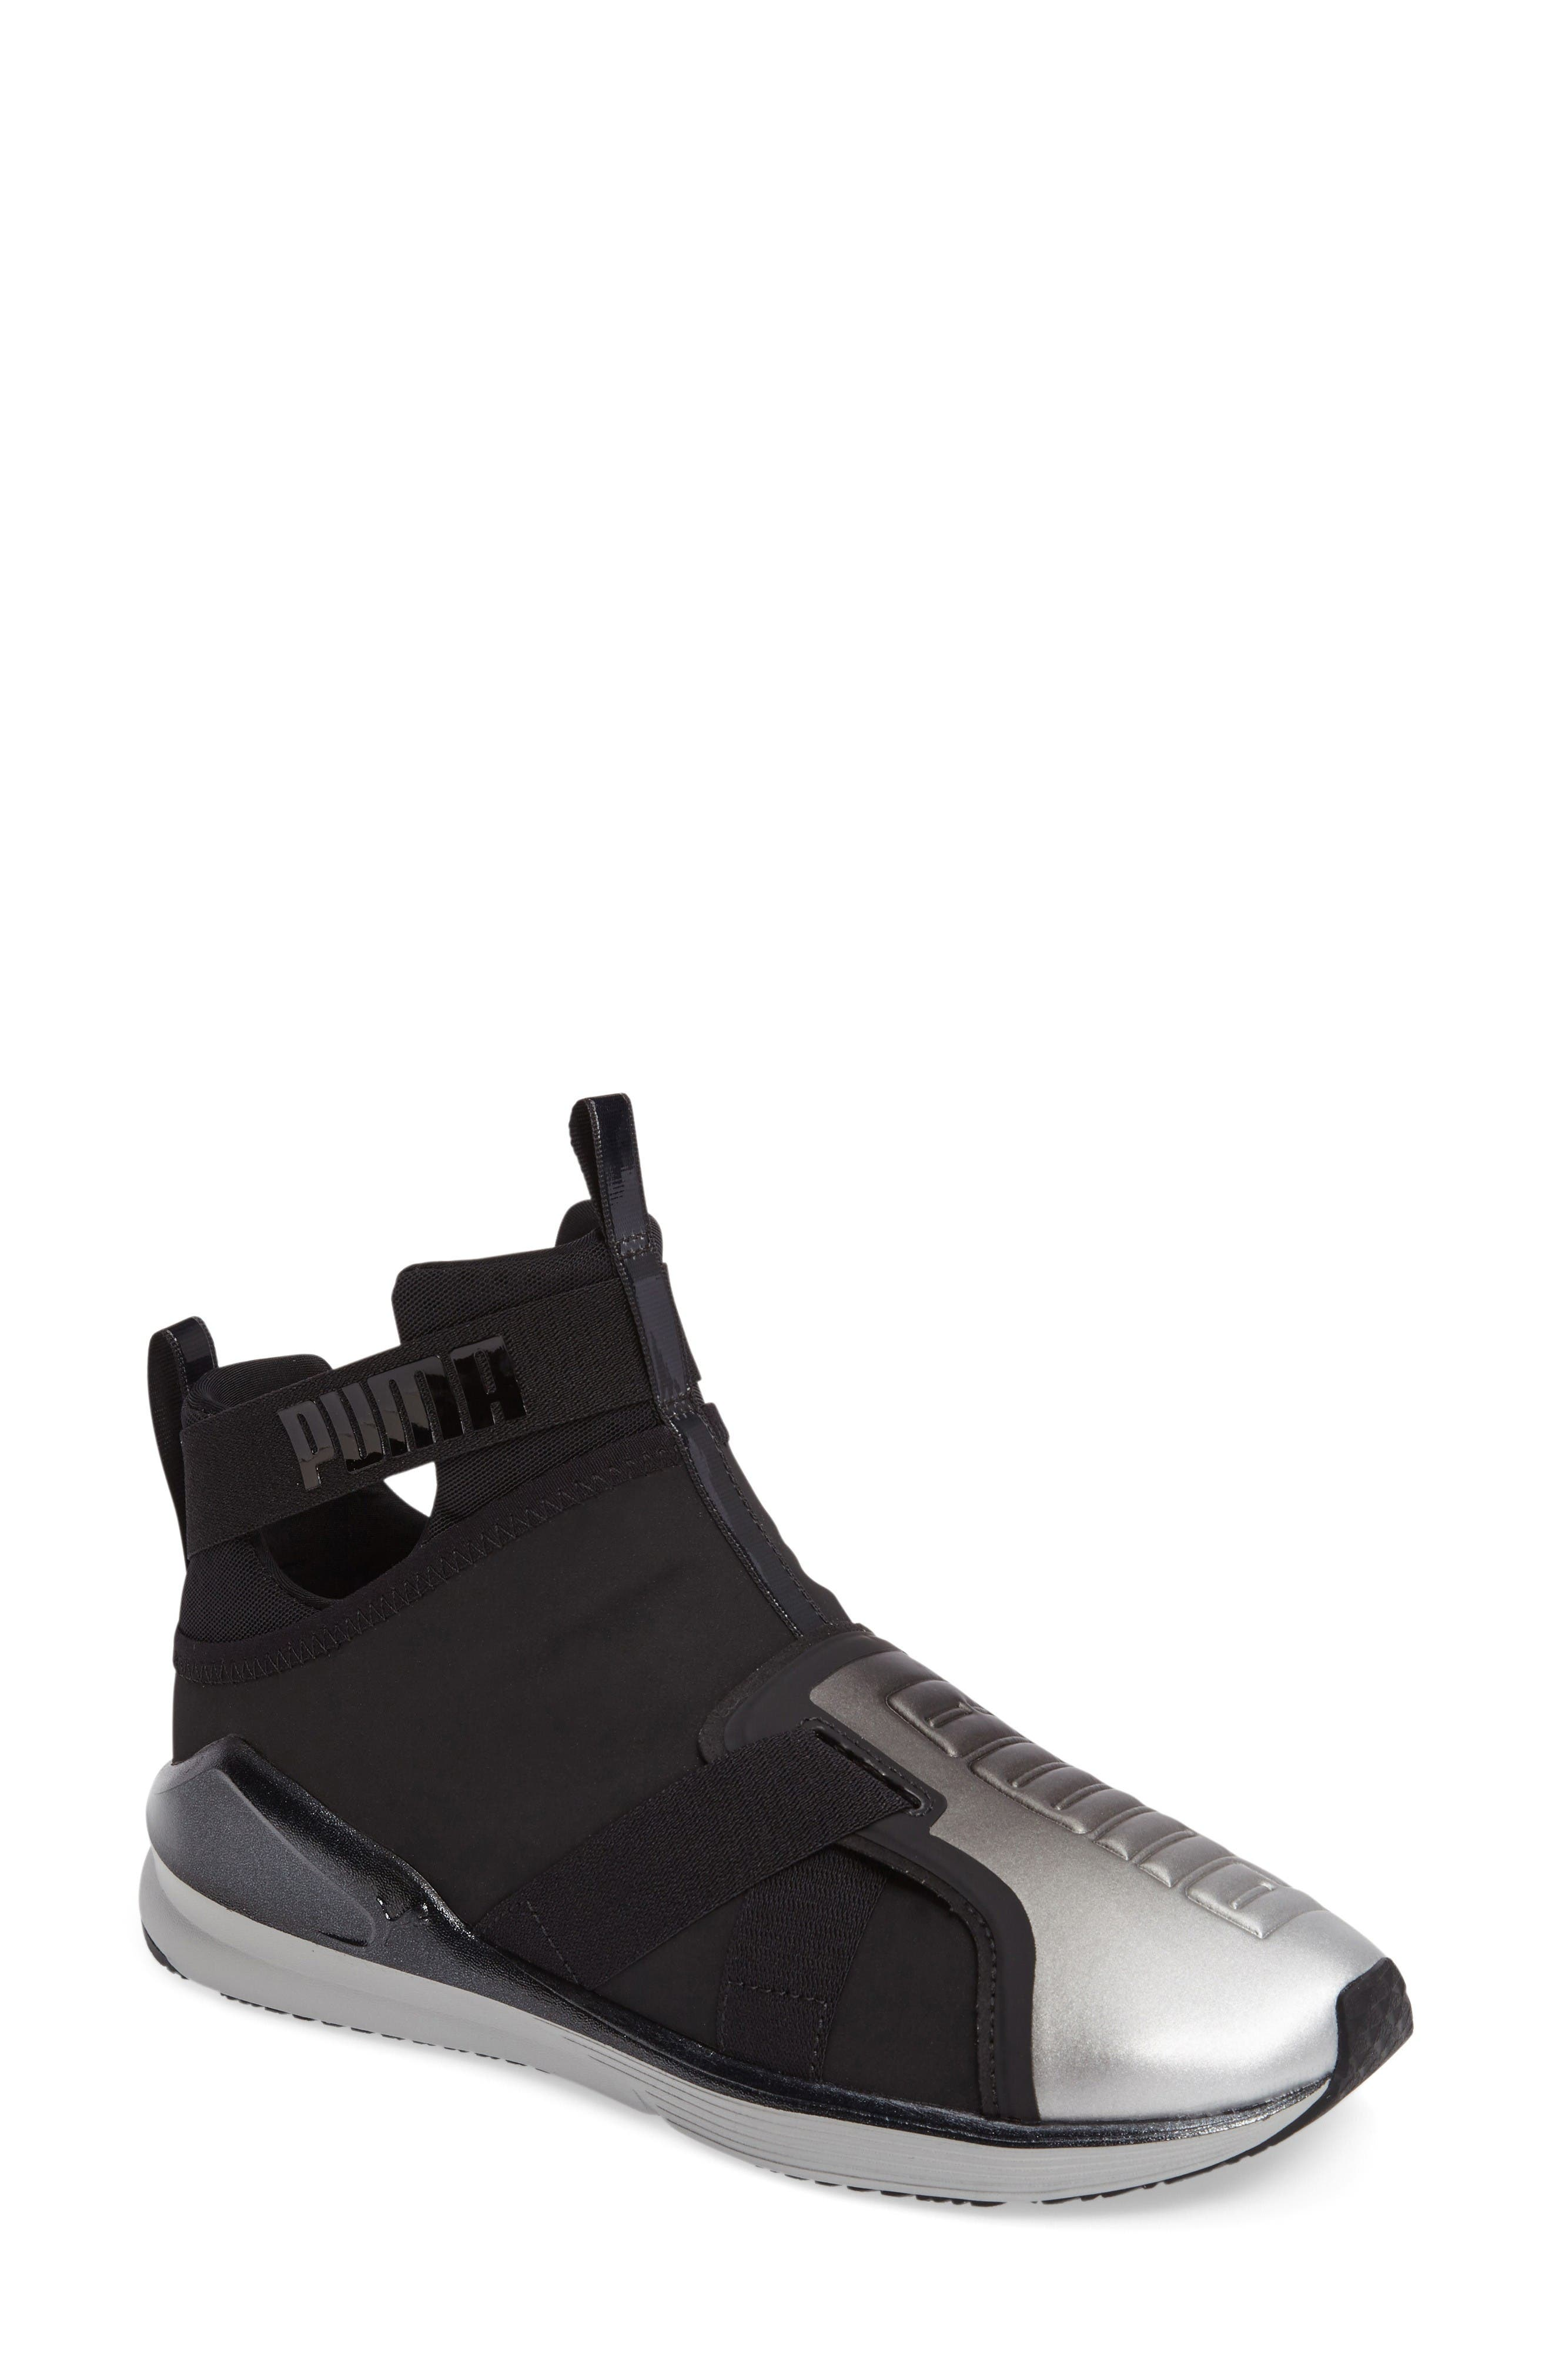 Main Image - PUMA Fierce High Top Sneaker (Women)